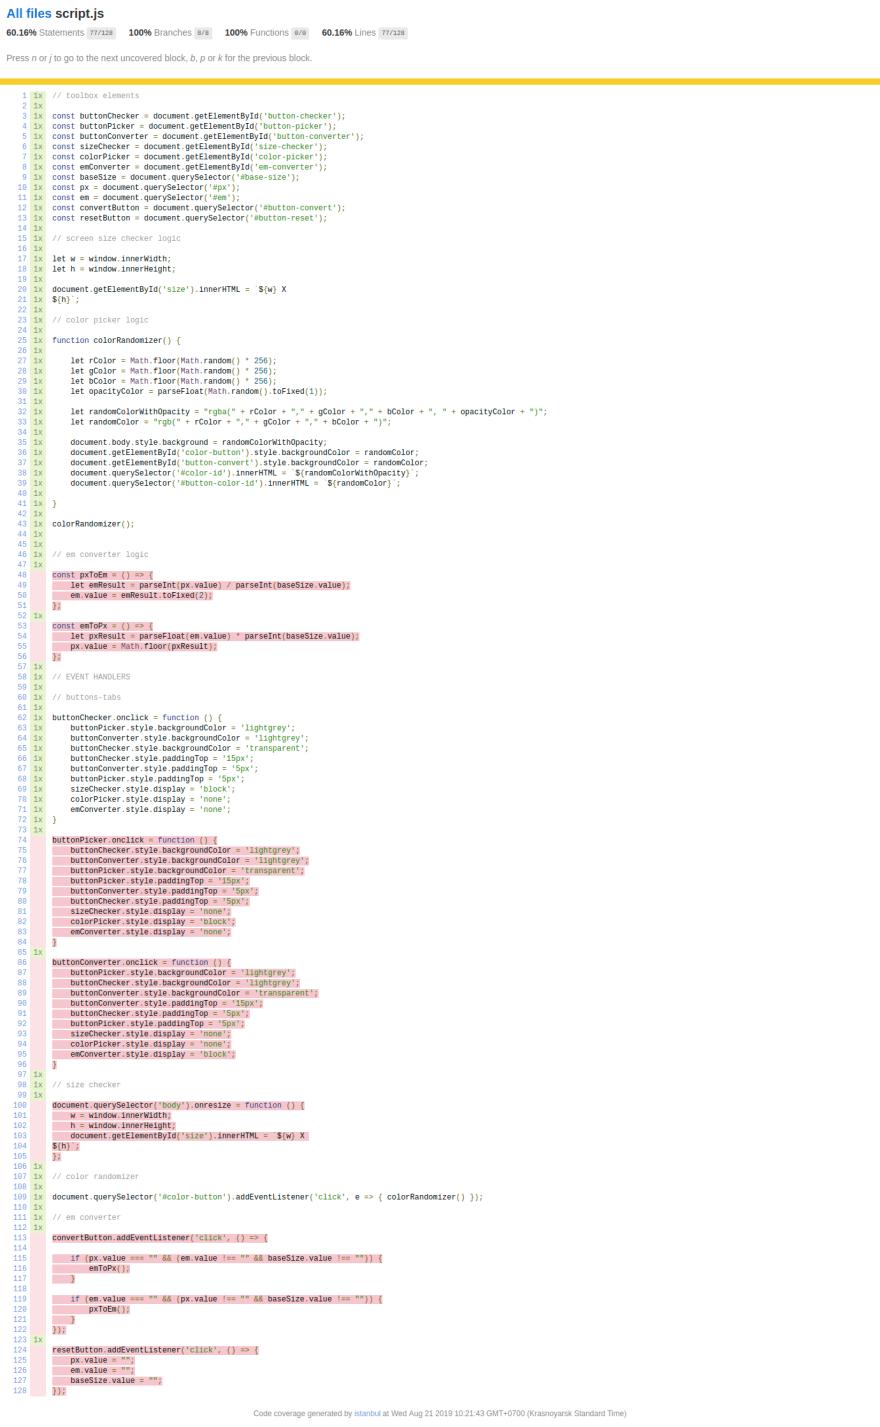 html coverage report